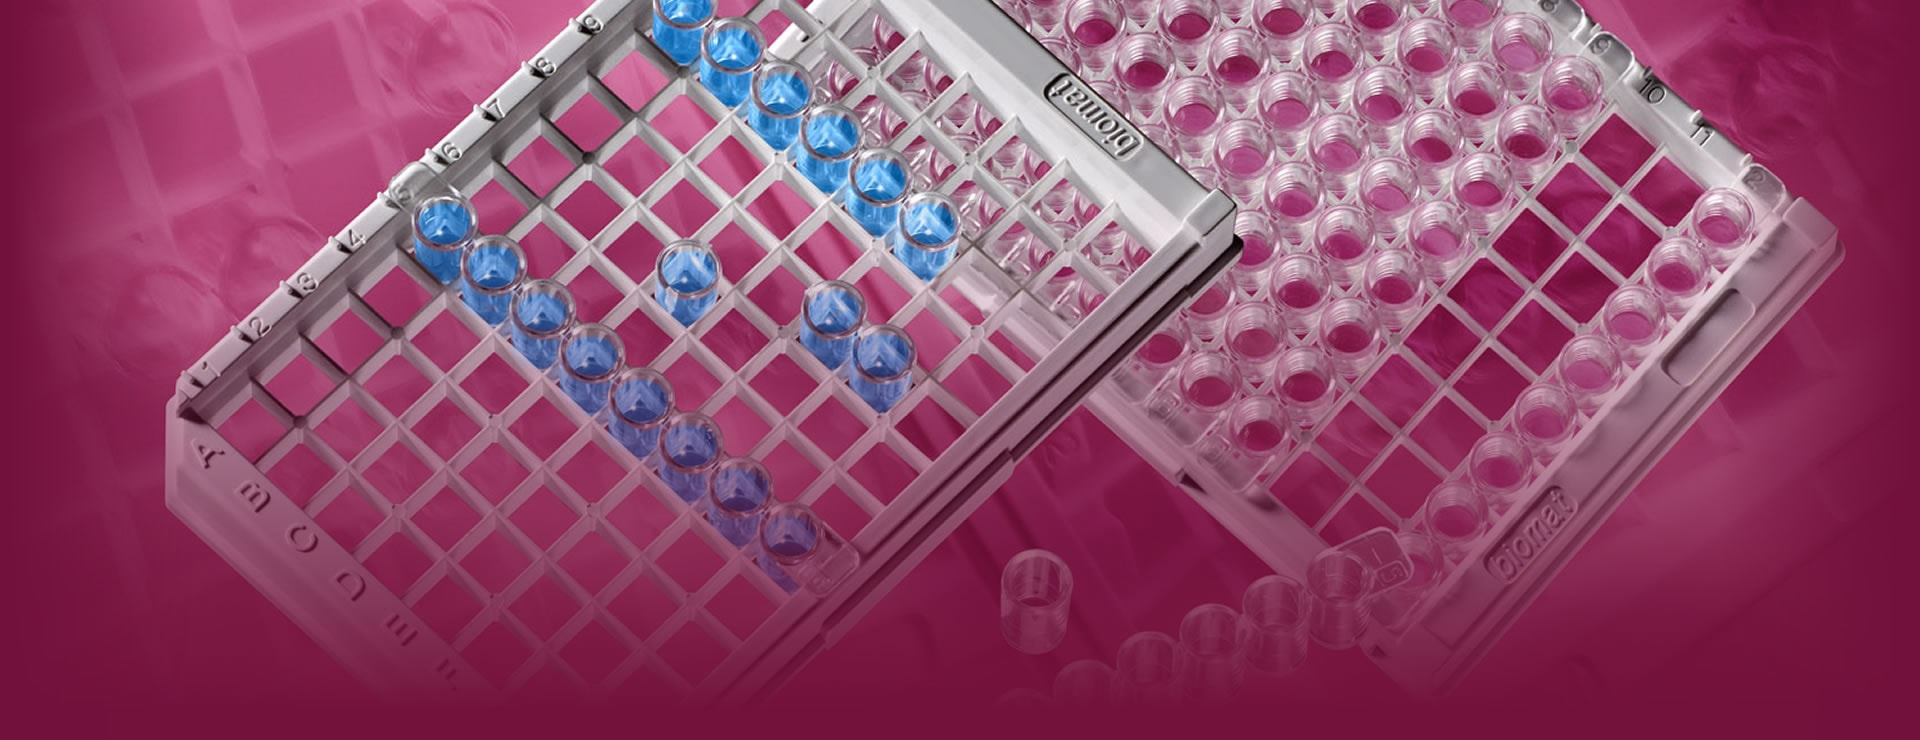 Biomat Microplates